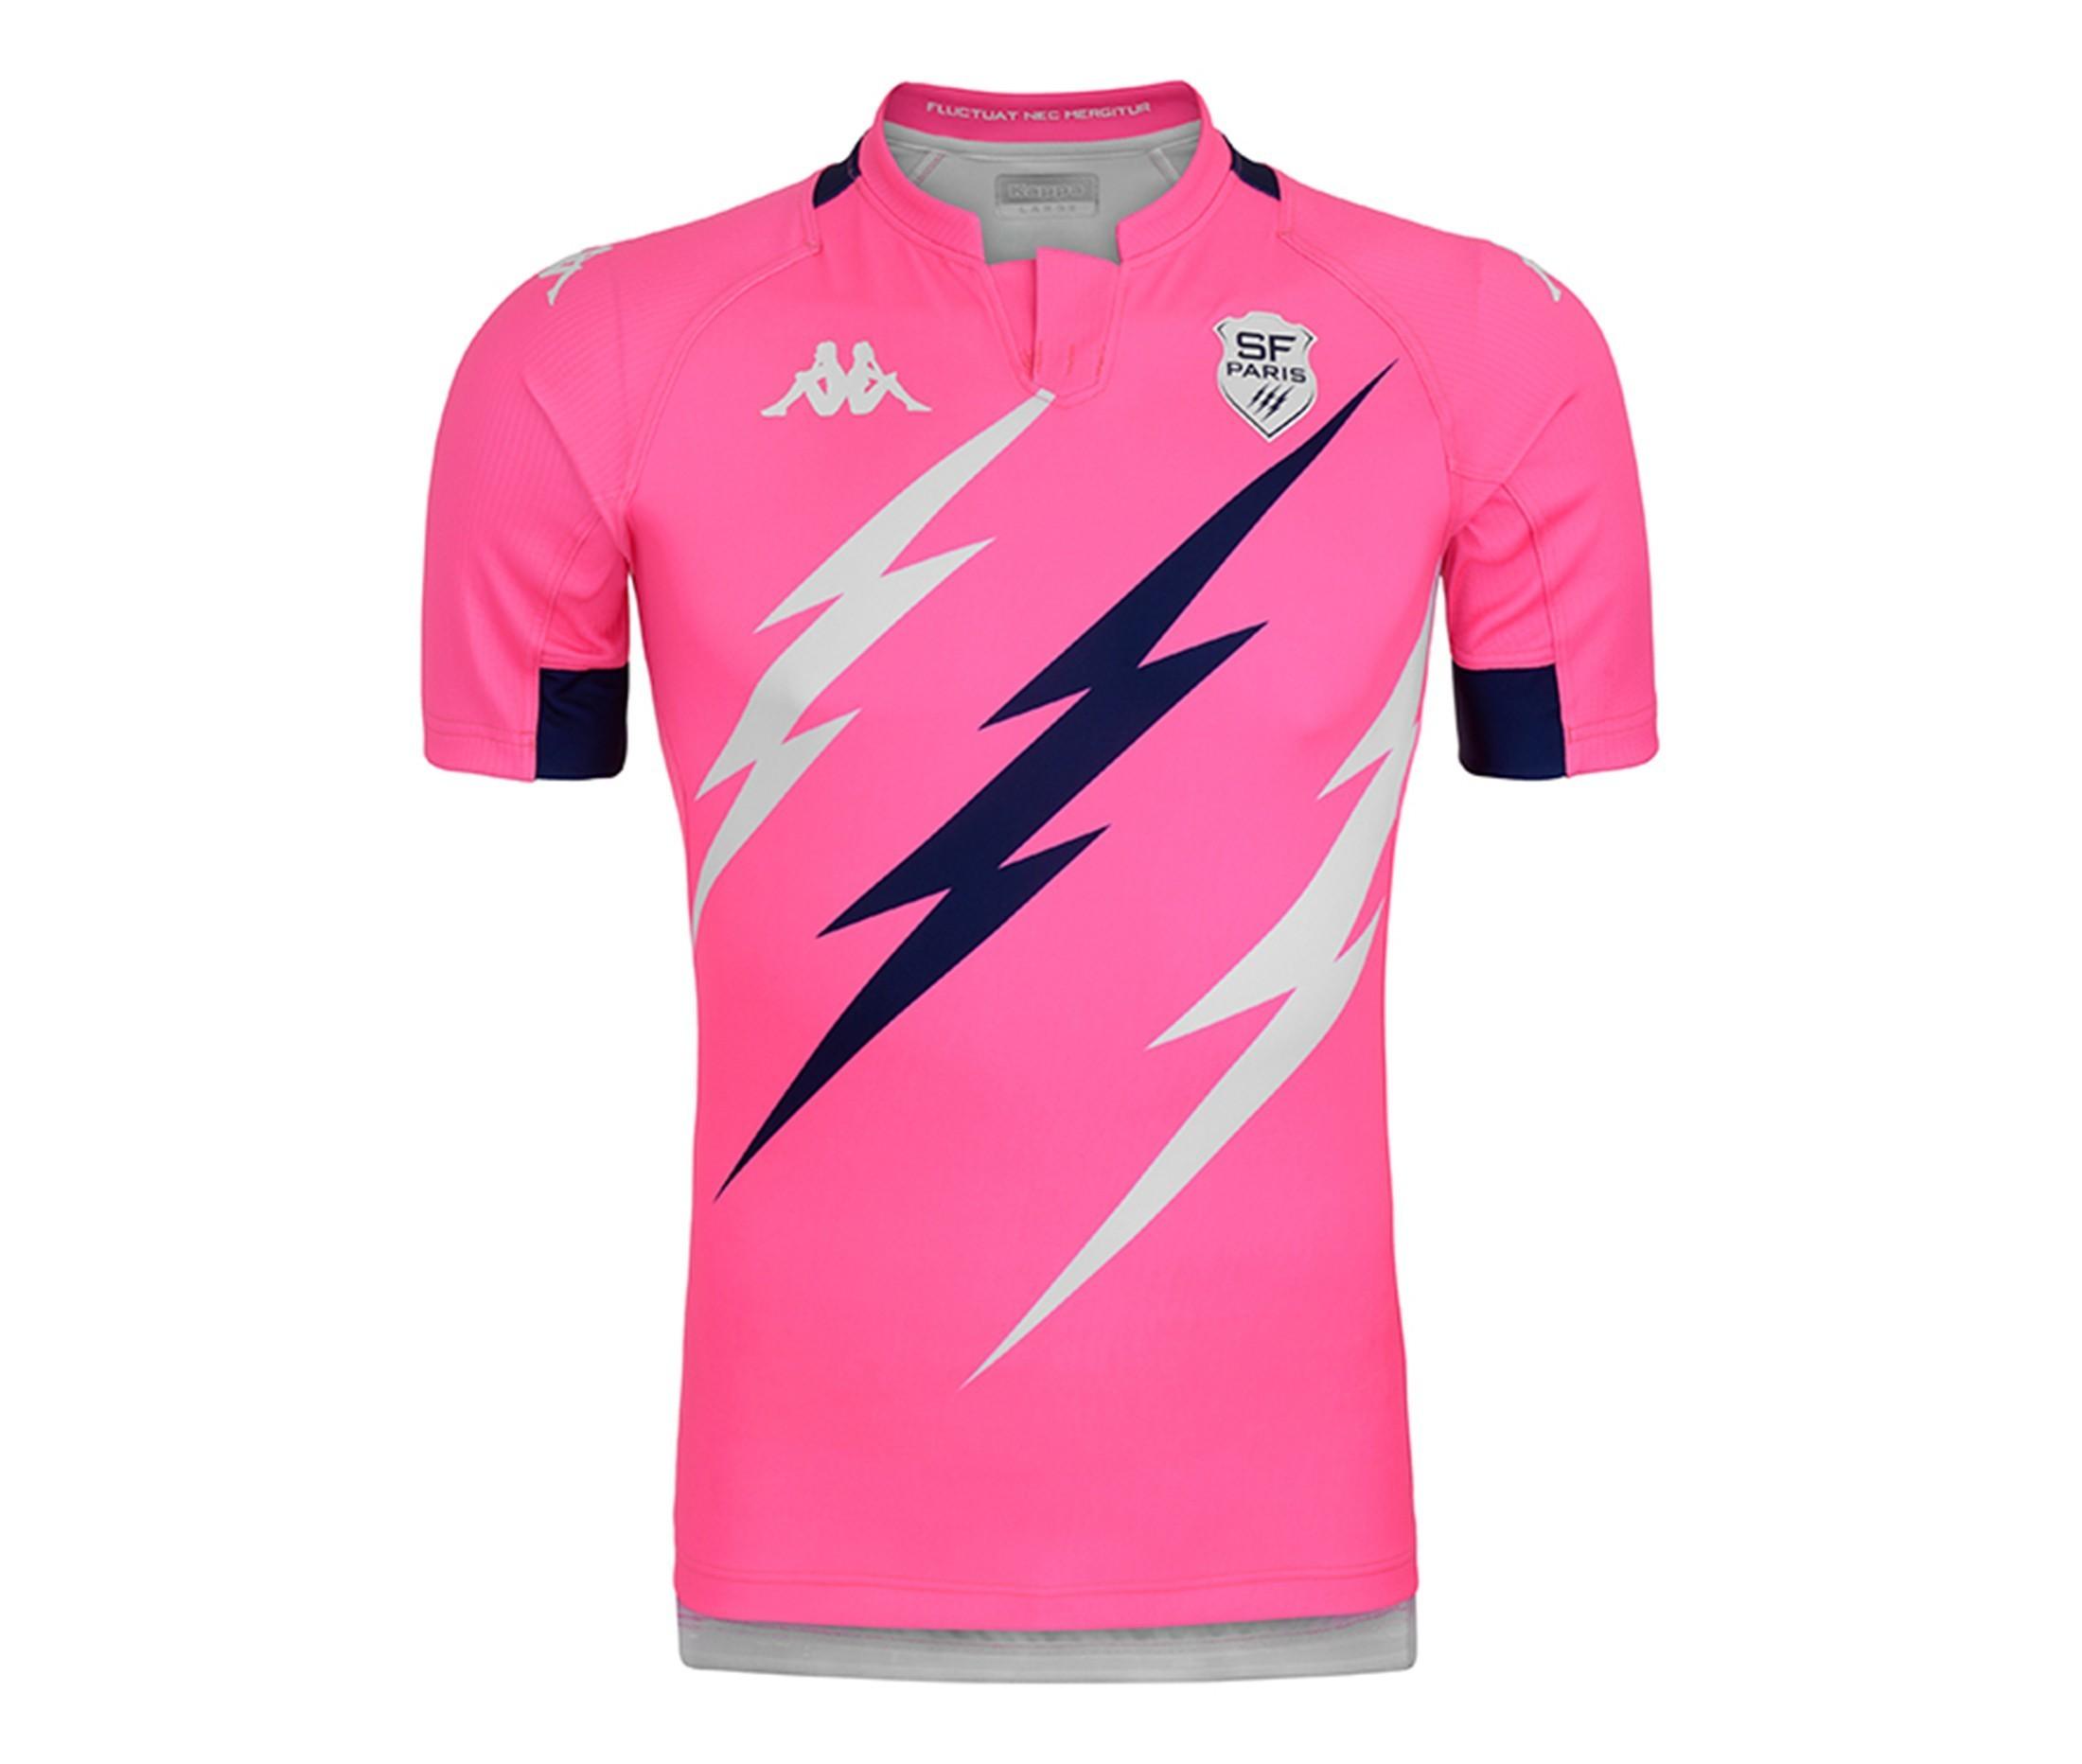 Maillot de Foot Rugby Home Taille S-3XL Coupe du Monde Adlna Team Japan Maillot pour Homme 2019 Maillot dentra/înement de Rugby